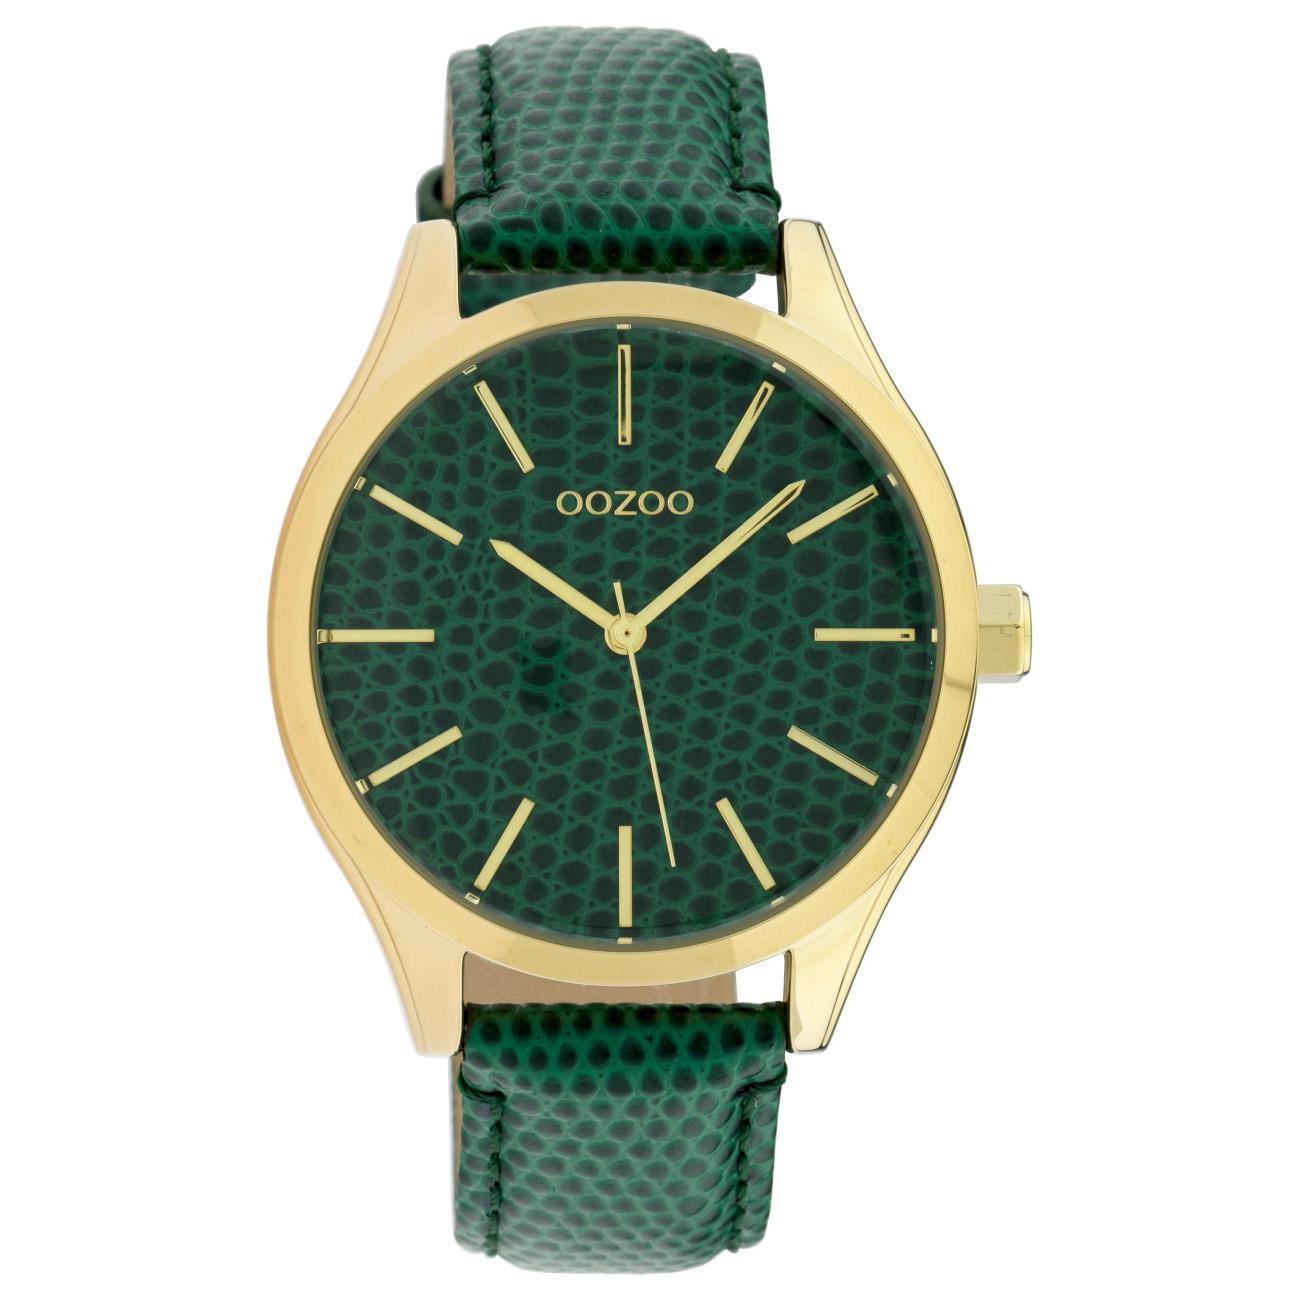 OOZOO C10432 Horloge Timepiece Collection Dark Green Snake 42 mm